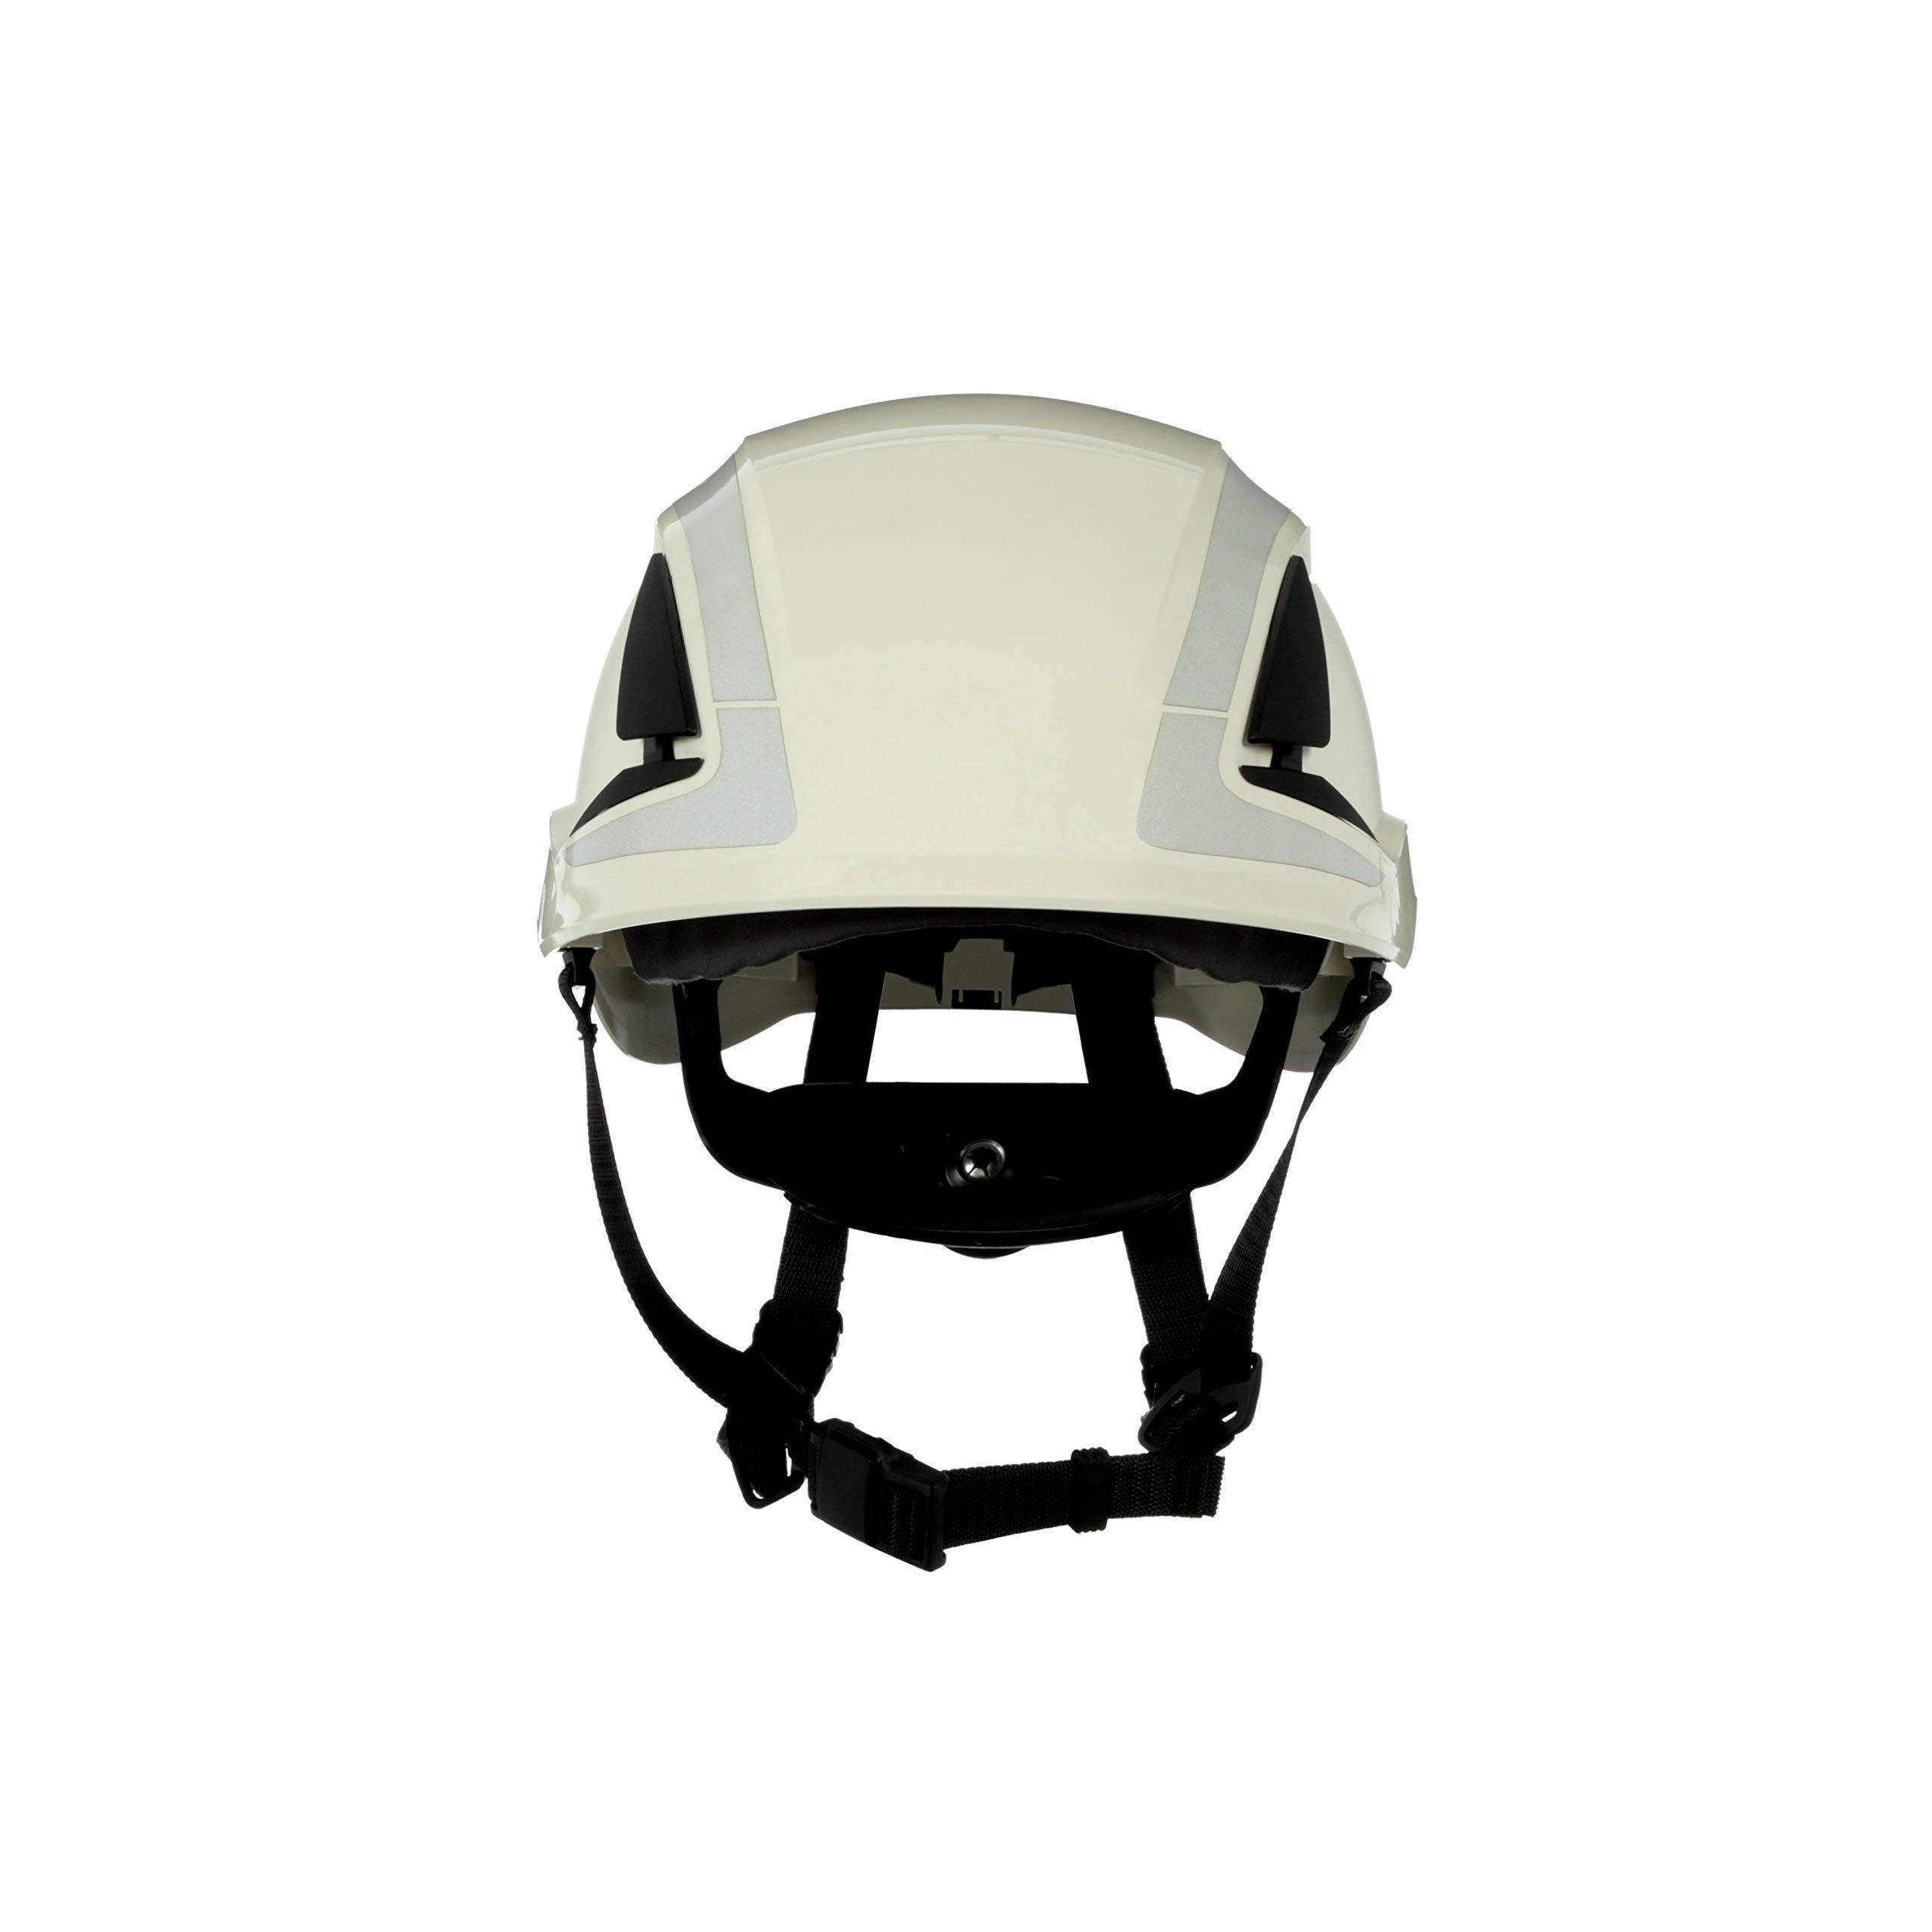 3M SecureFit Safety Helmet, X5001X-ANSI, White